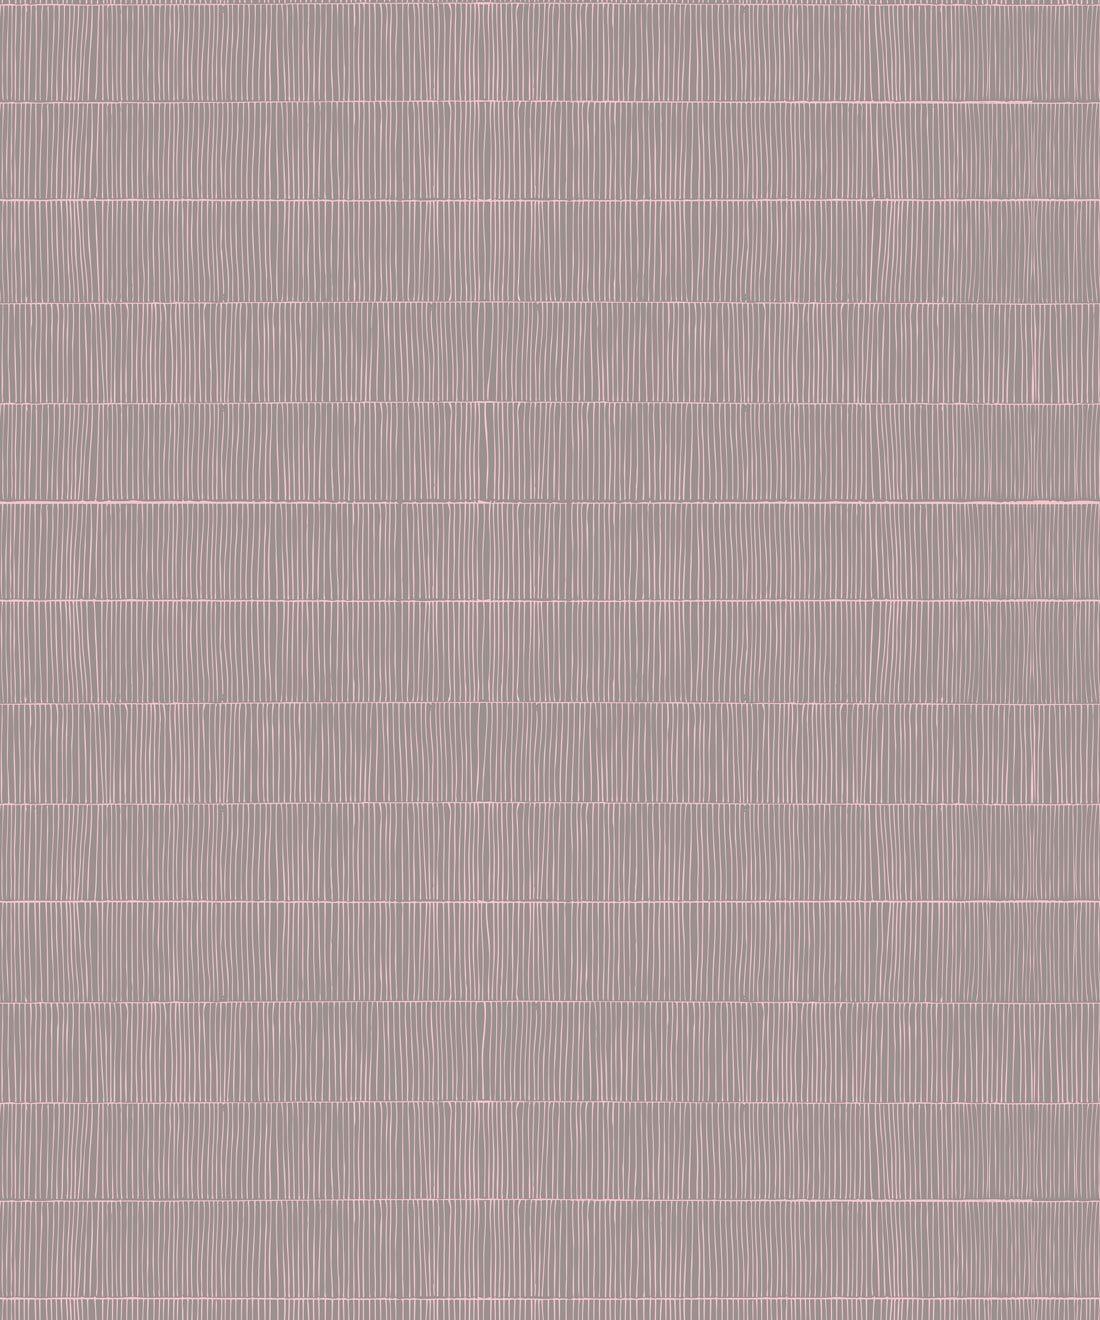 Salt of the Earth - Pink Thread Wallpaper